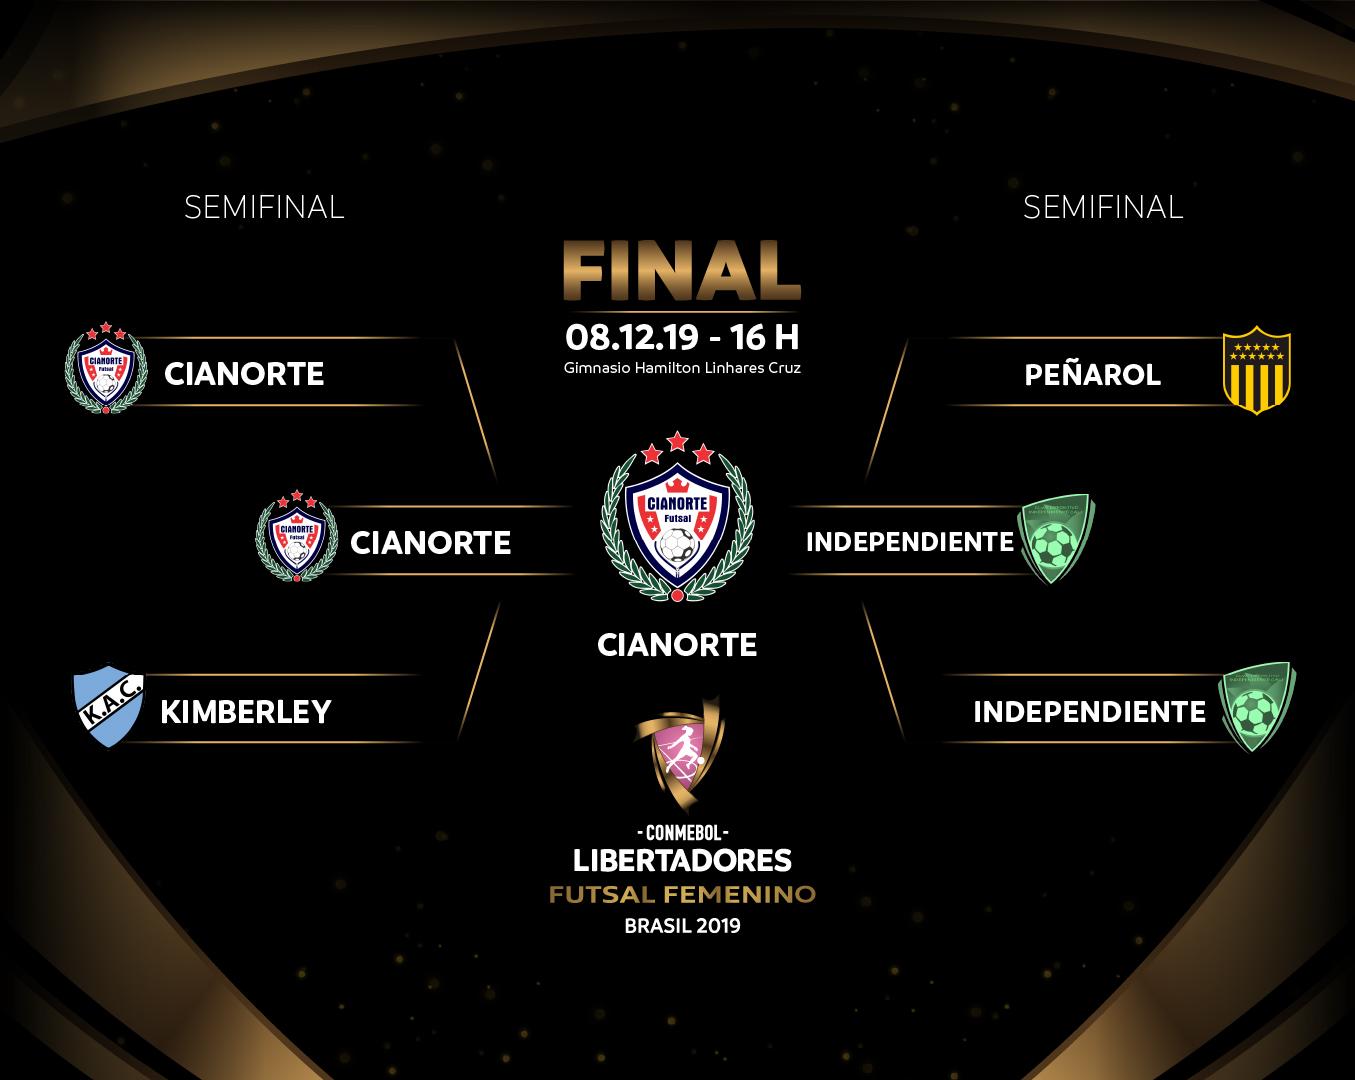 Chave final Libertadores Futsal Feminino